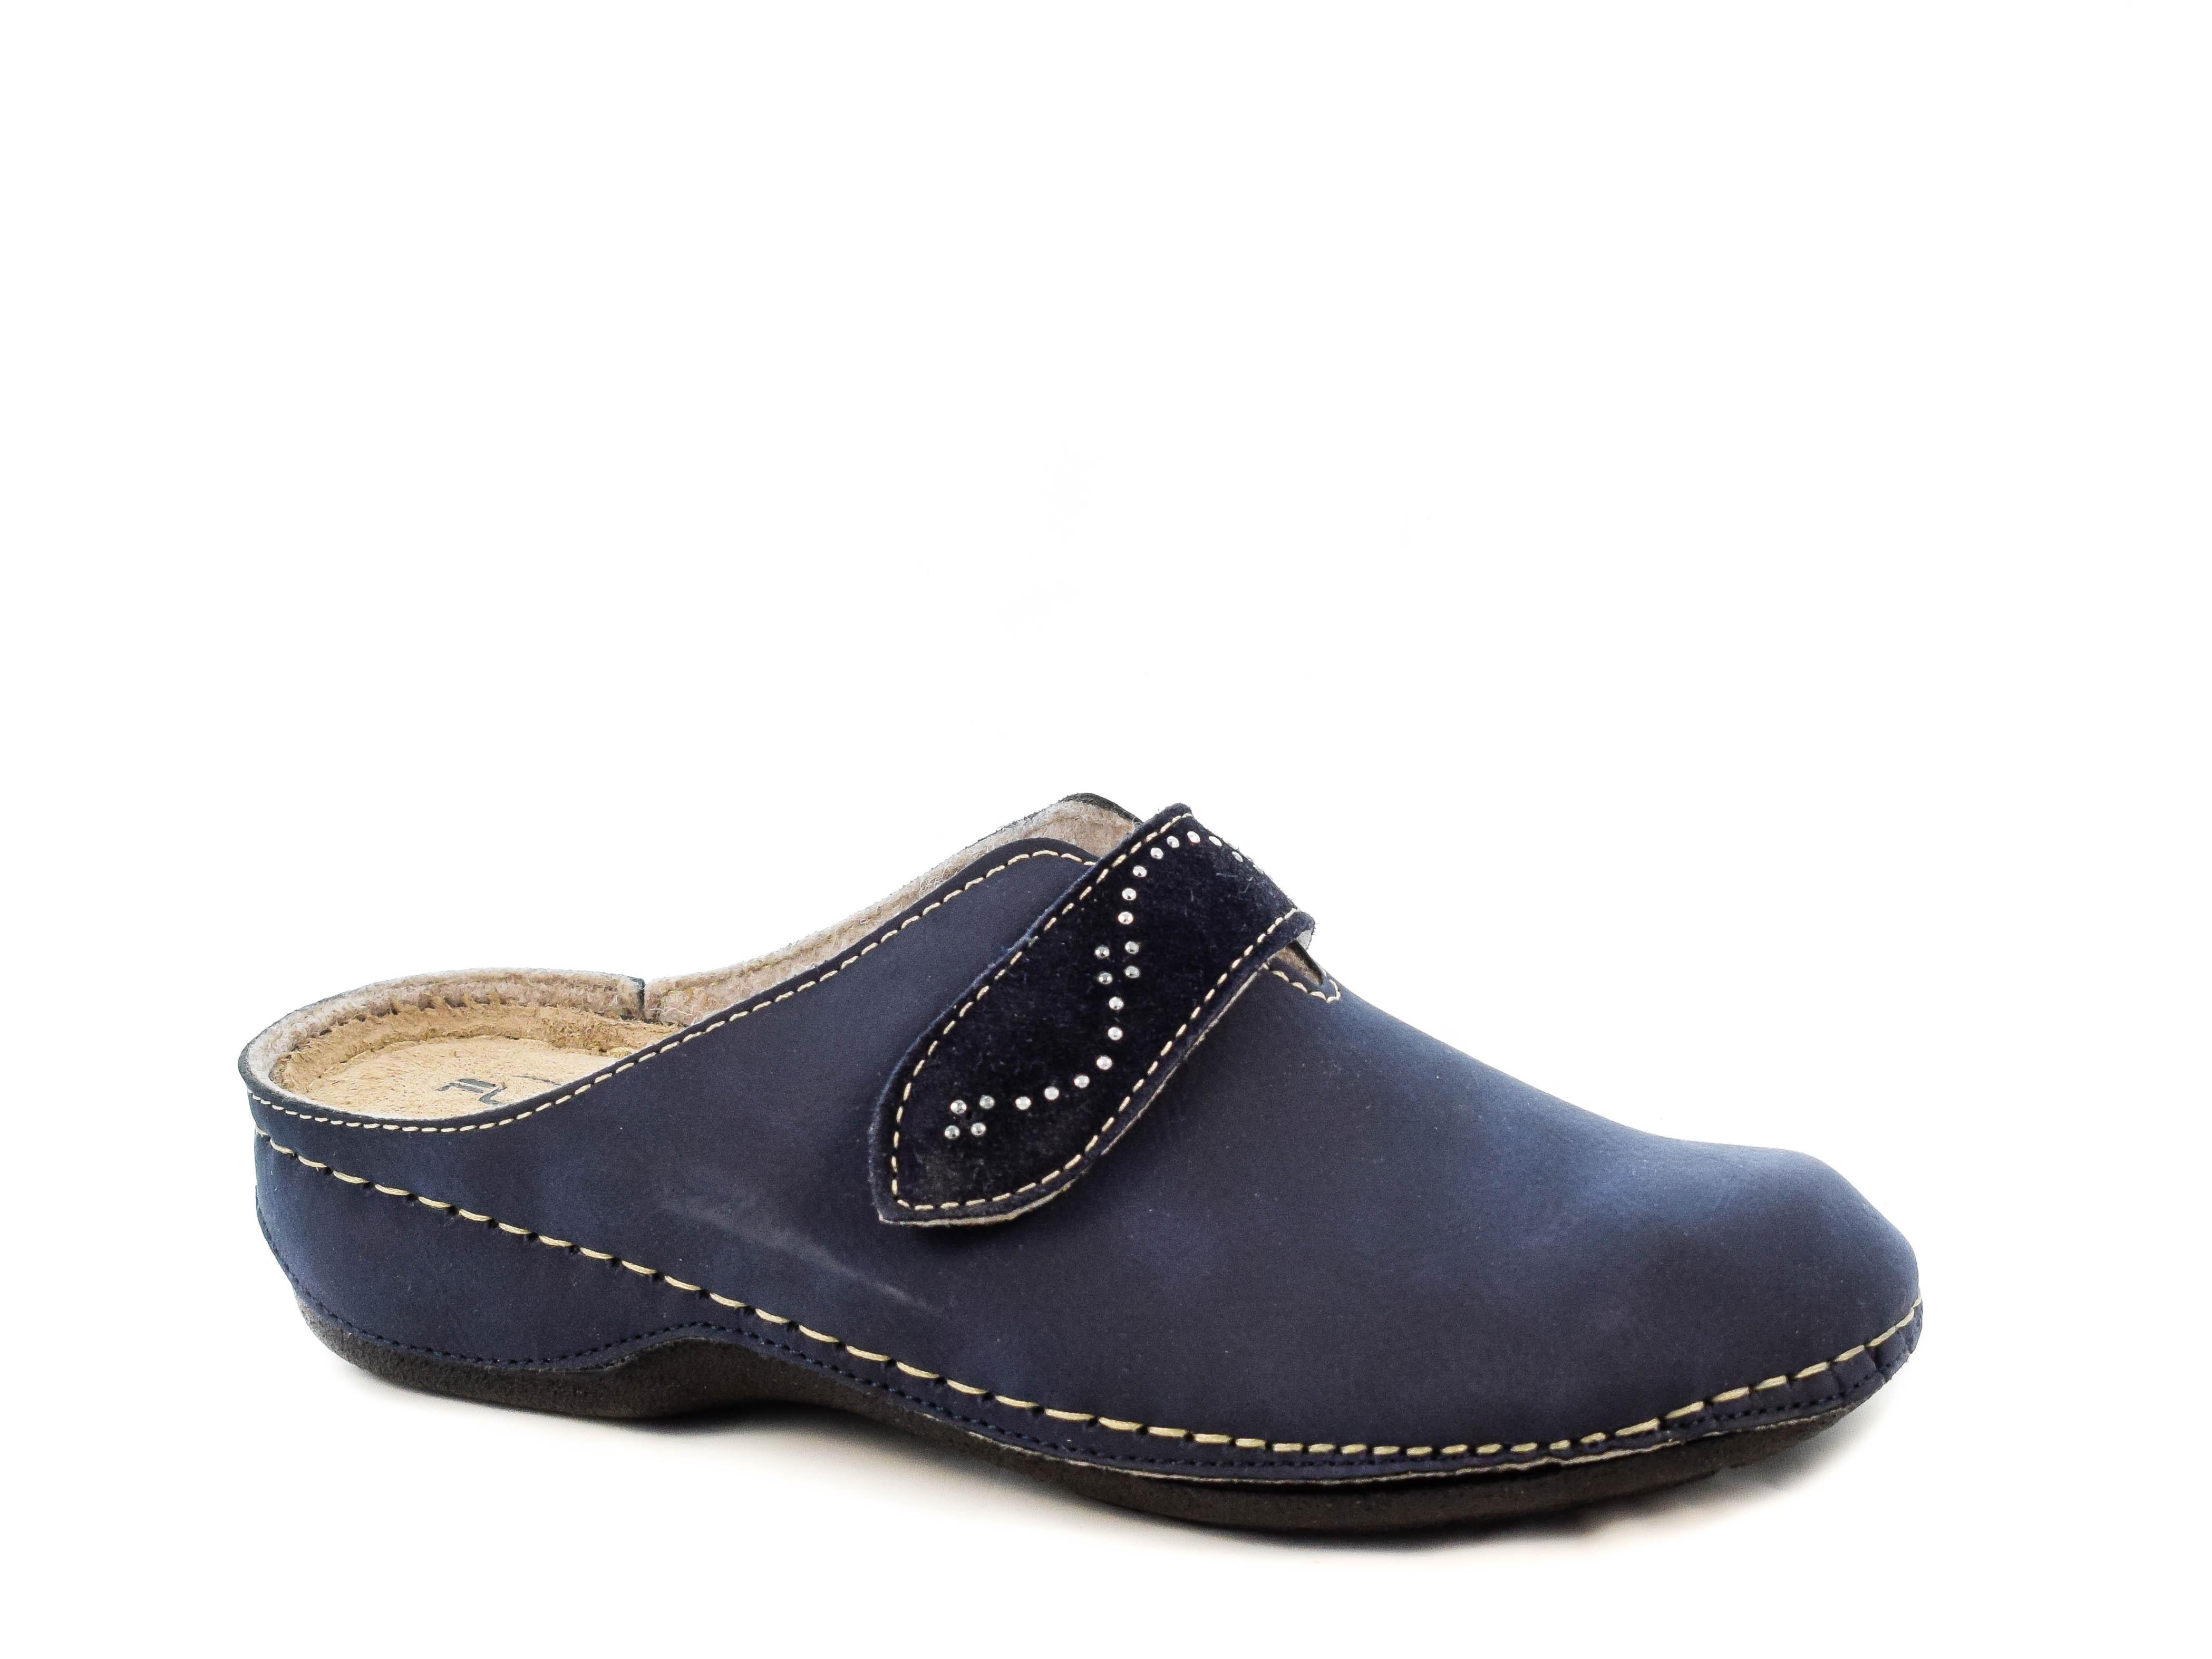 PATRIZIA FL2707 NAVY Μπλε σκούρο